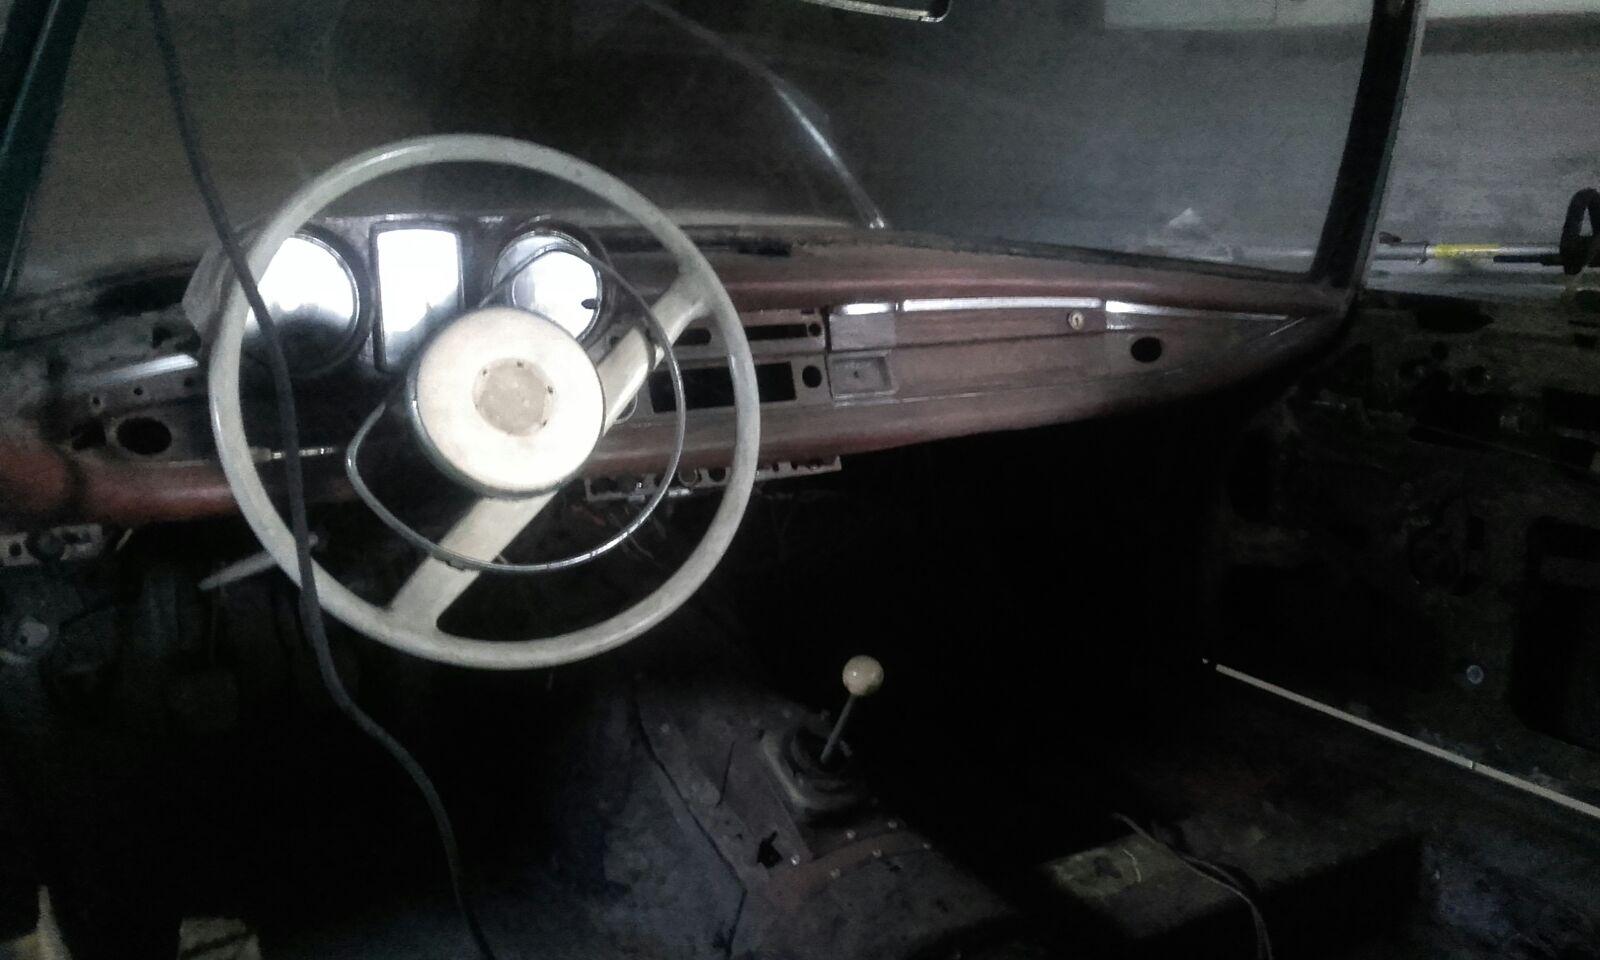 Coches cl sicos para restaurar coche cl sico - Mini clasico para restaurar ...